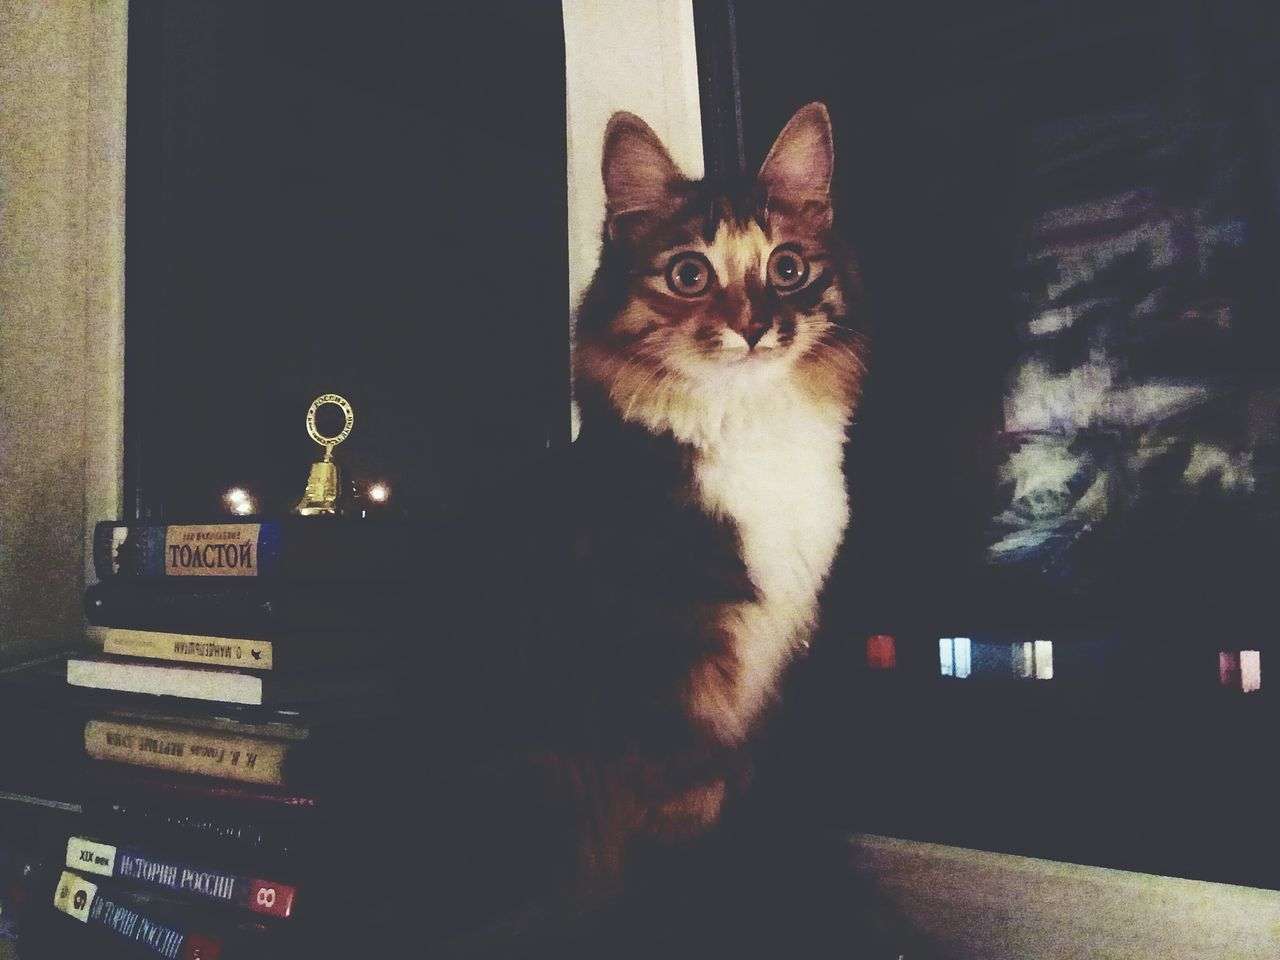 domestic cat, pets, domestic animals, one animal, mammal, animal themes, feline, cat, no people, sitting, indoors, portrait, day